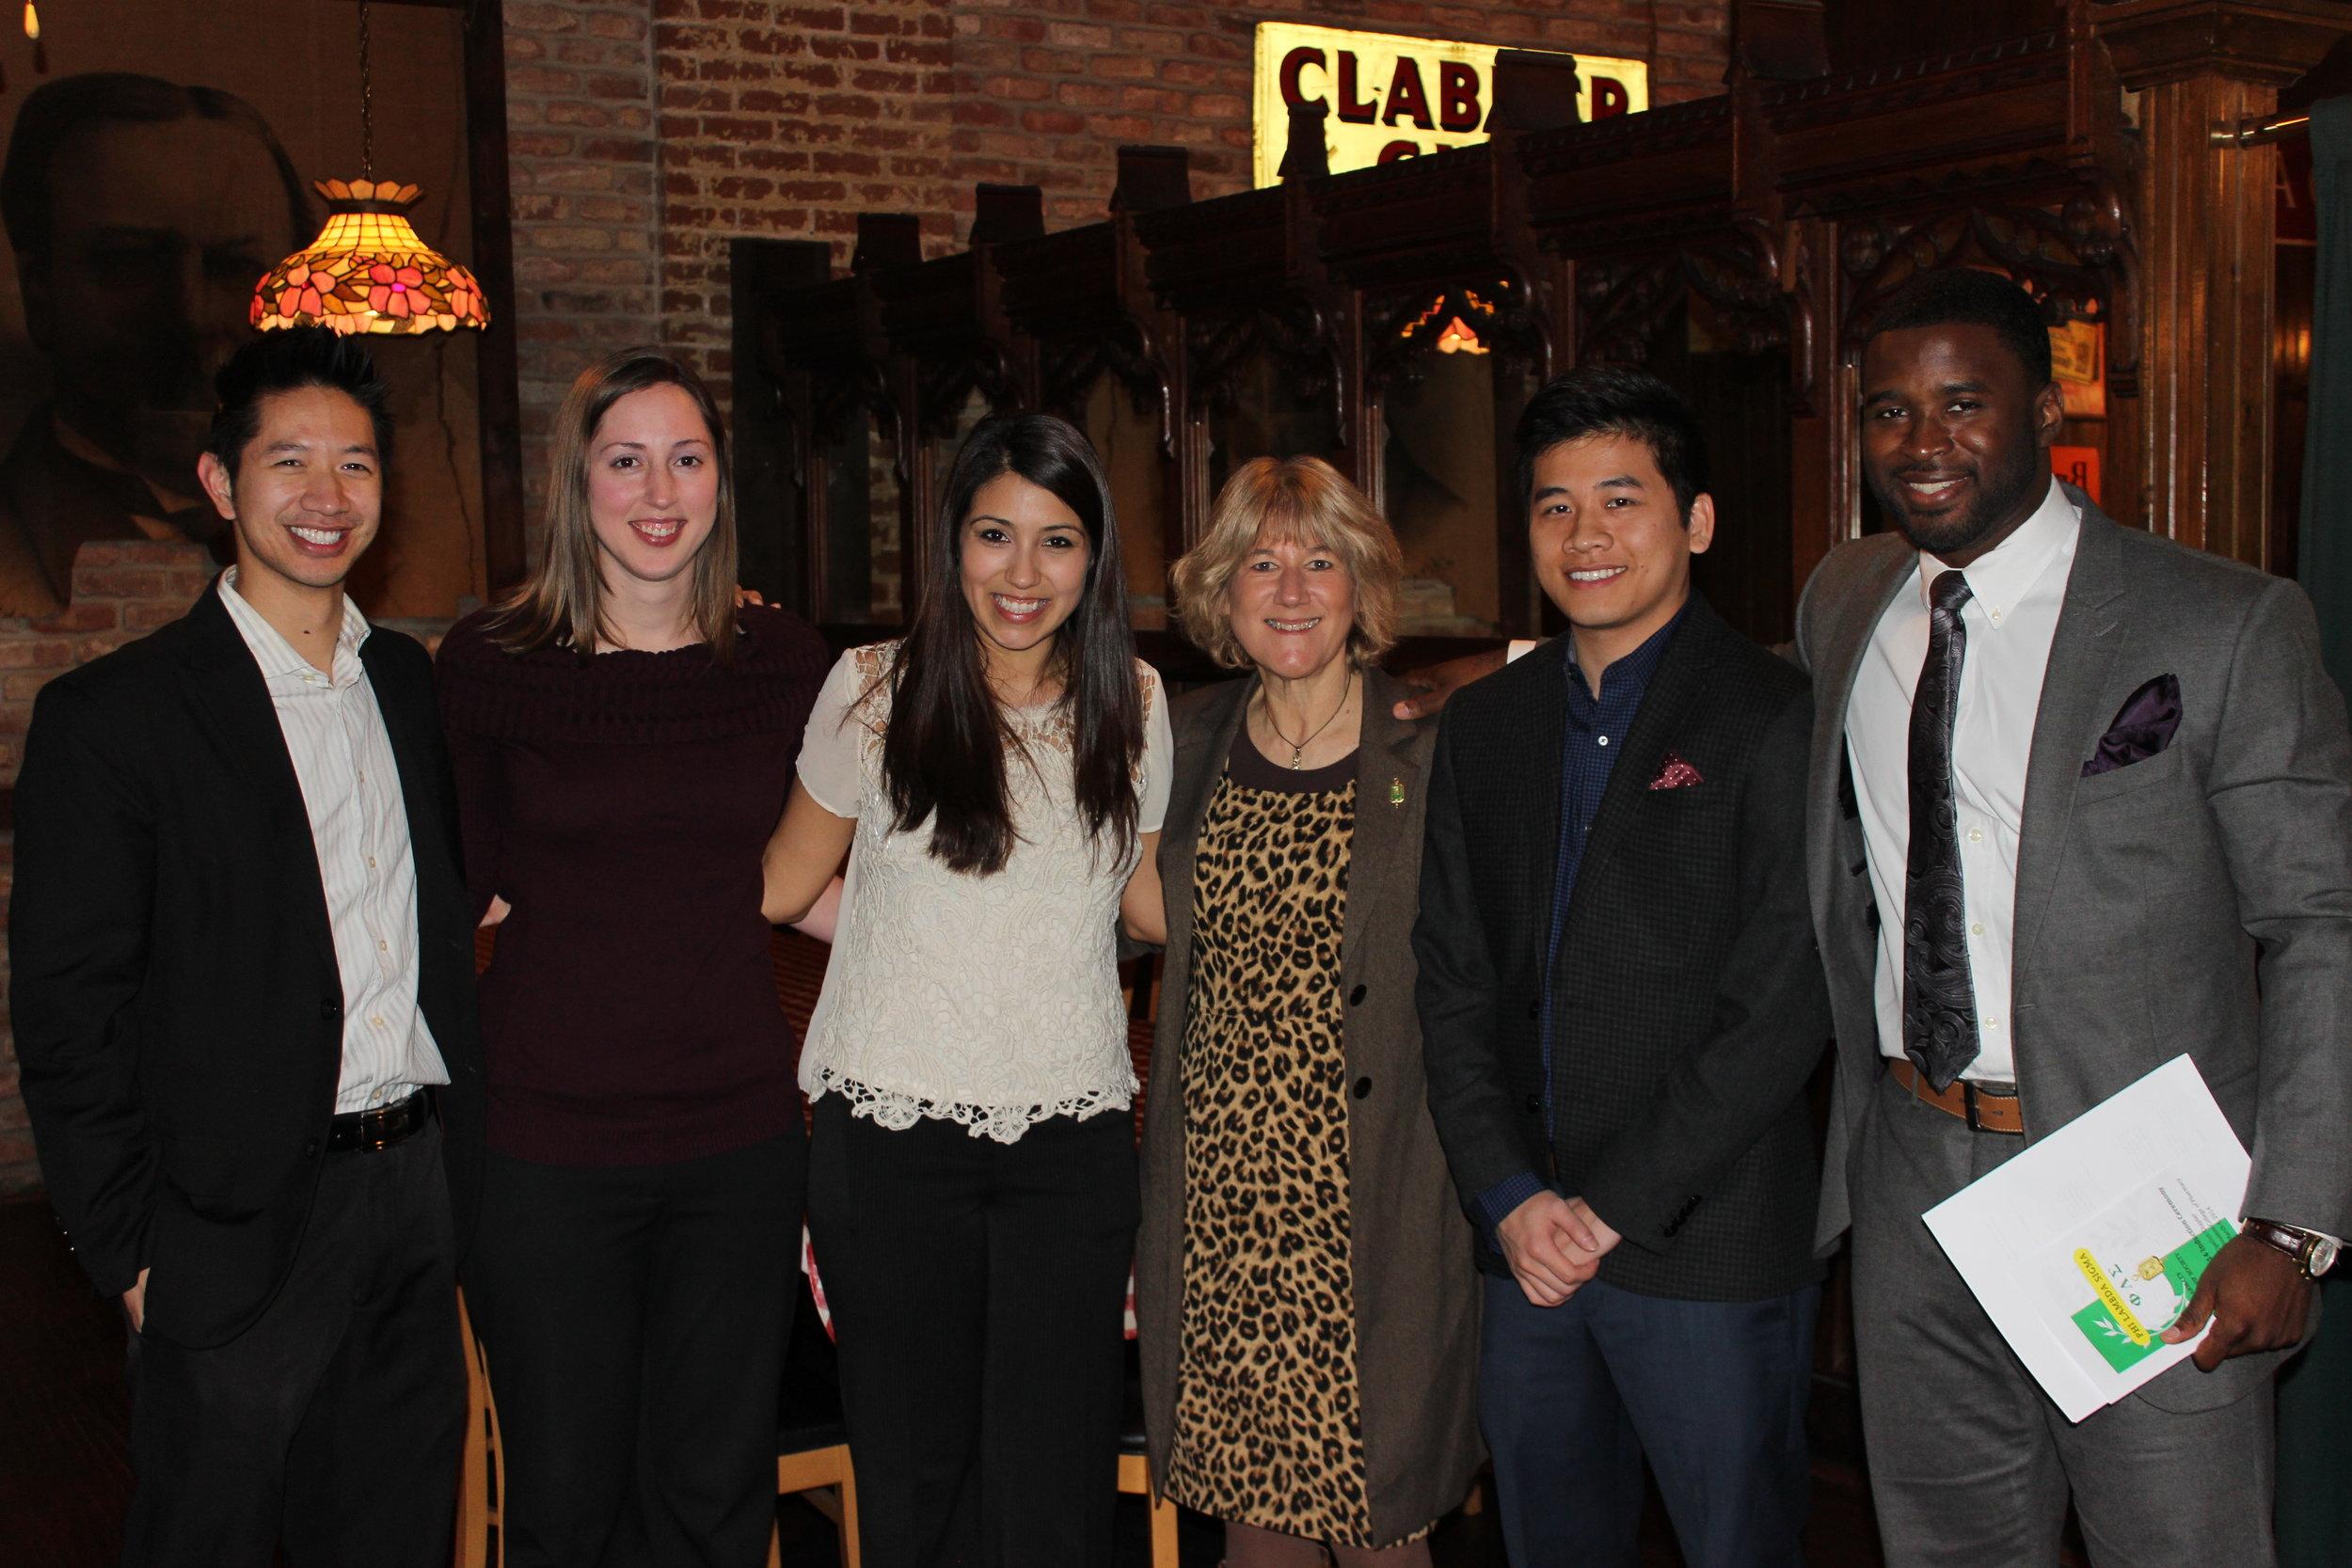 2013-2014 Officers L-R: Daniel Nguyen, Rachel Eppinette, Tara Molina, Dr. Lynn Simpson (Advisor), Tam Nguyen, Osagie (Tony) Ohonba